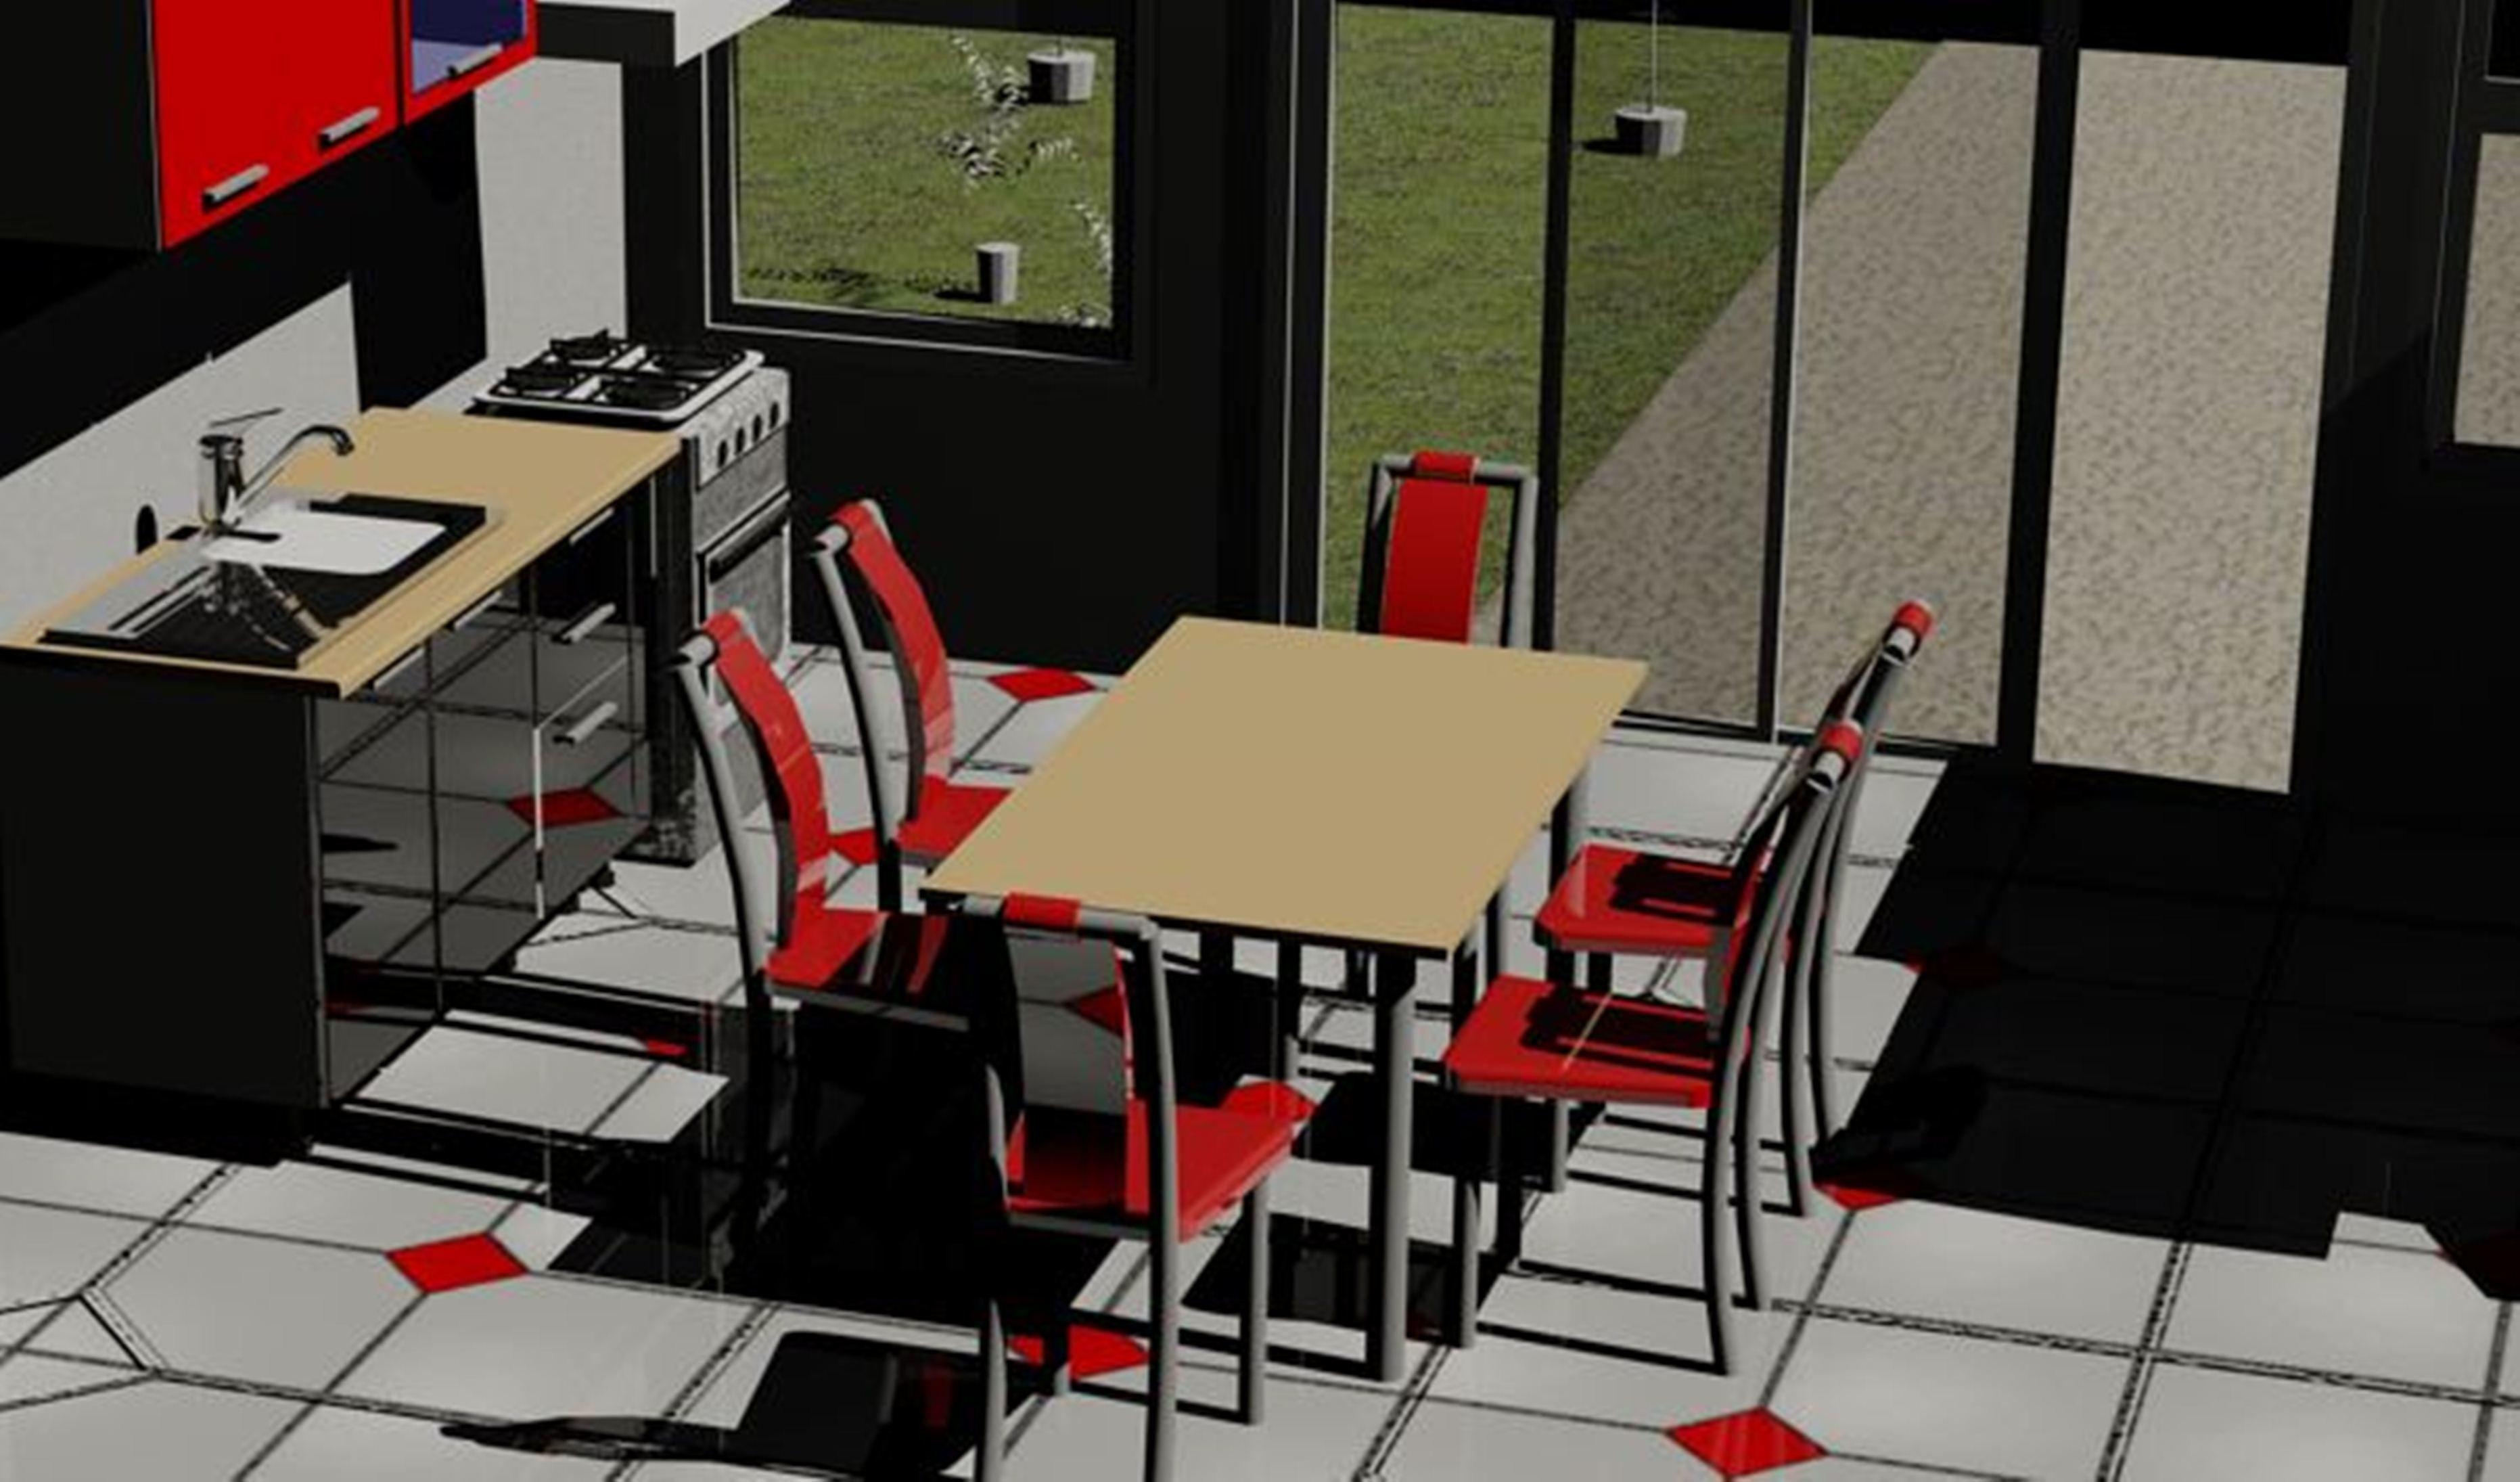 Restaurant Kitchen 3d Model red kitchen ver 1 3d model | cgtrader